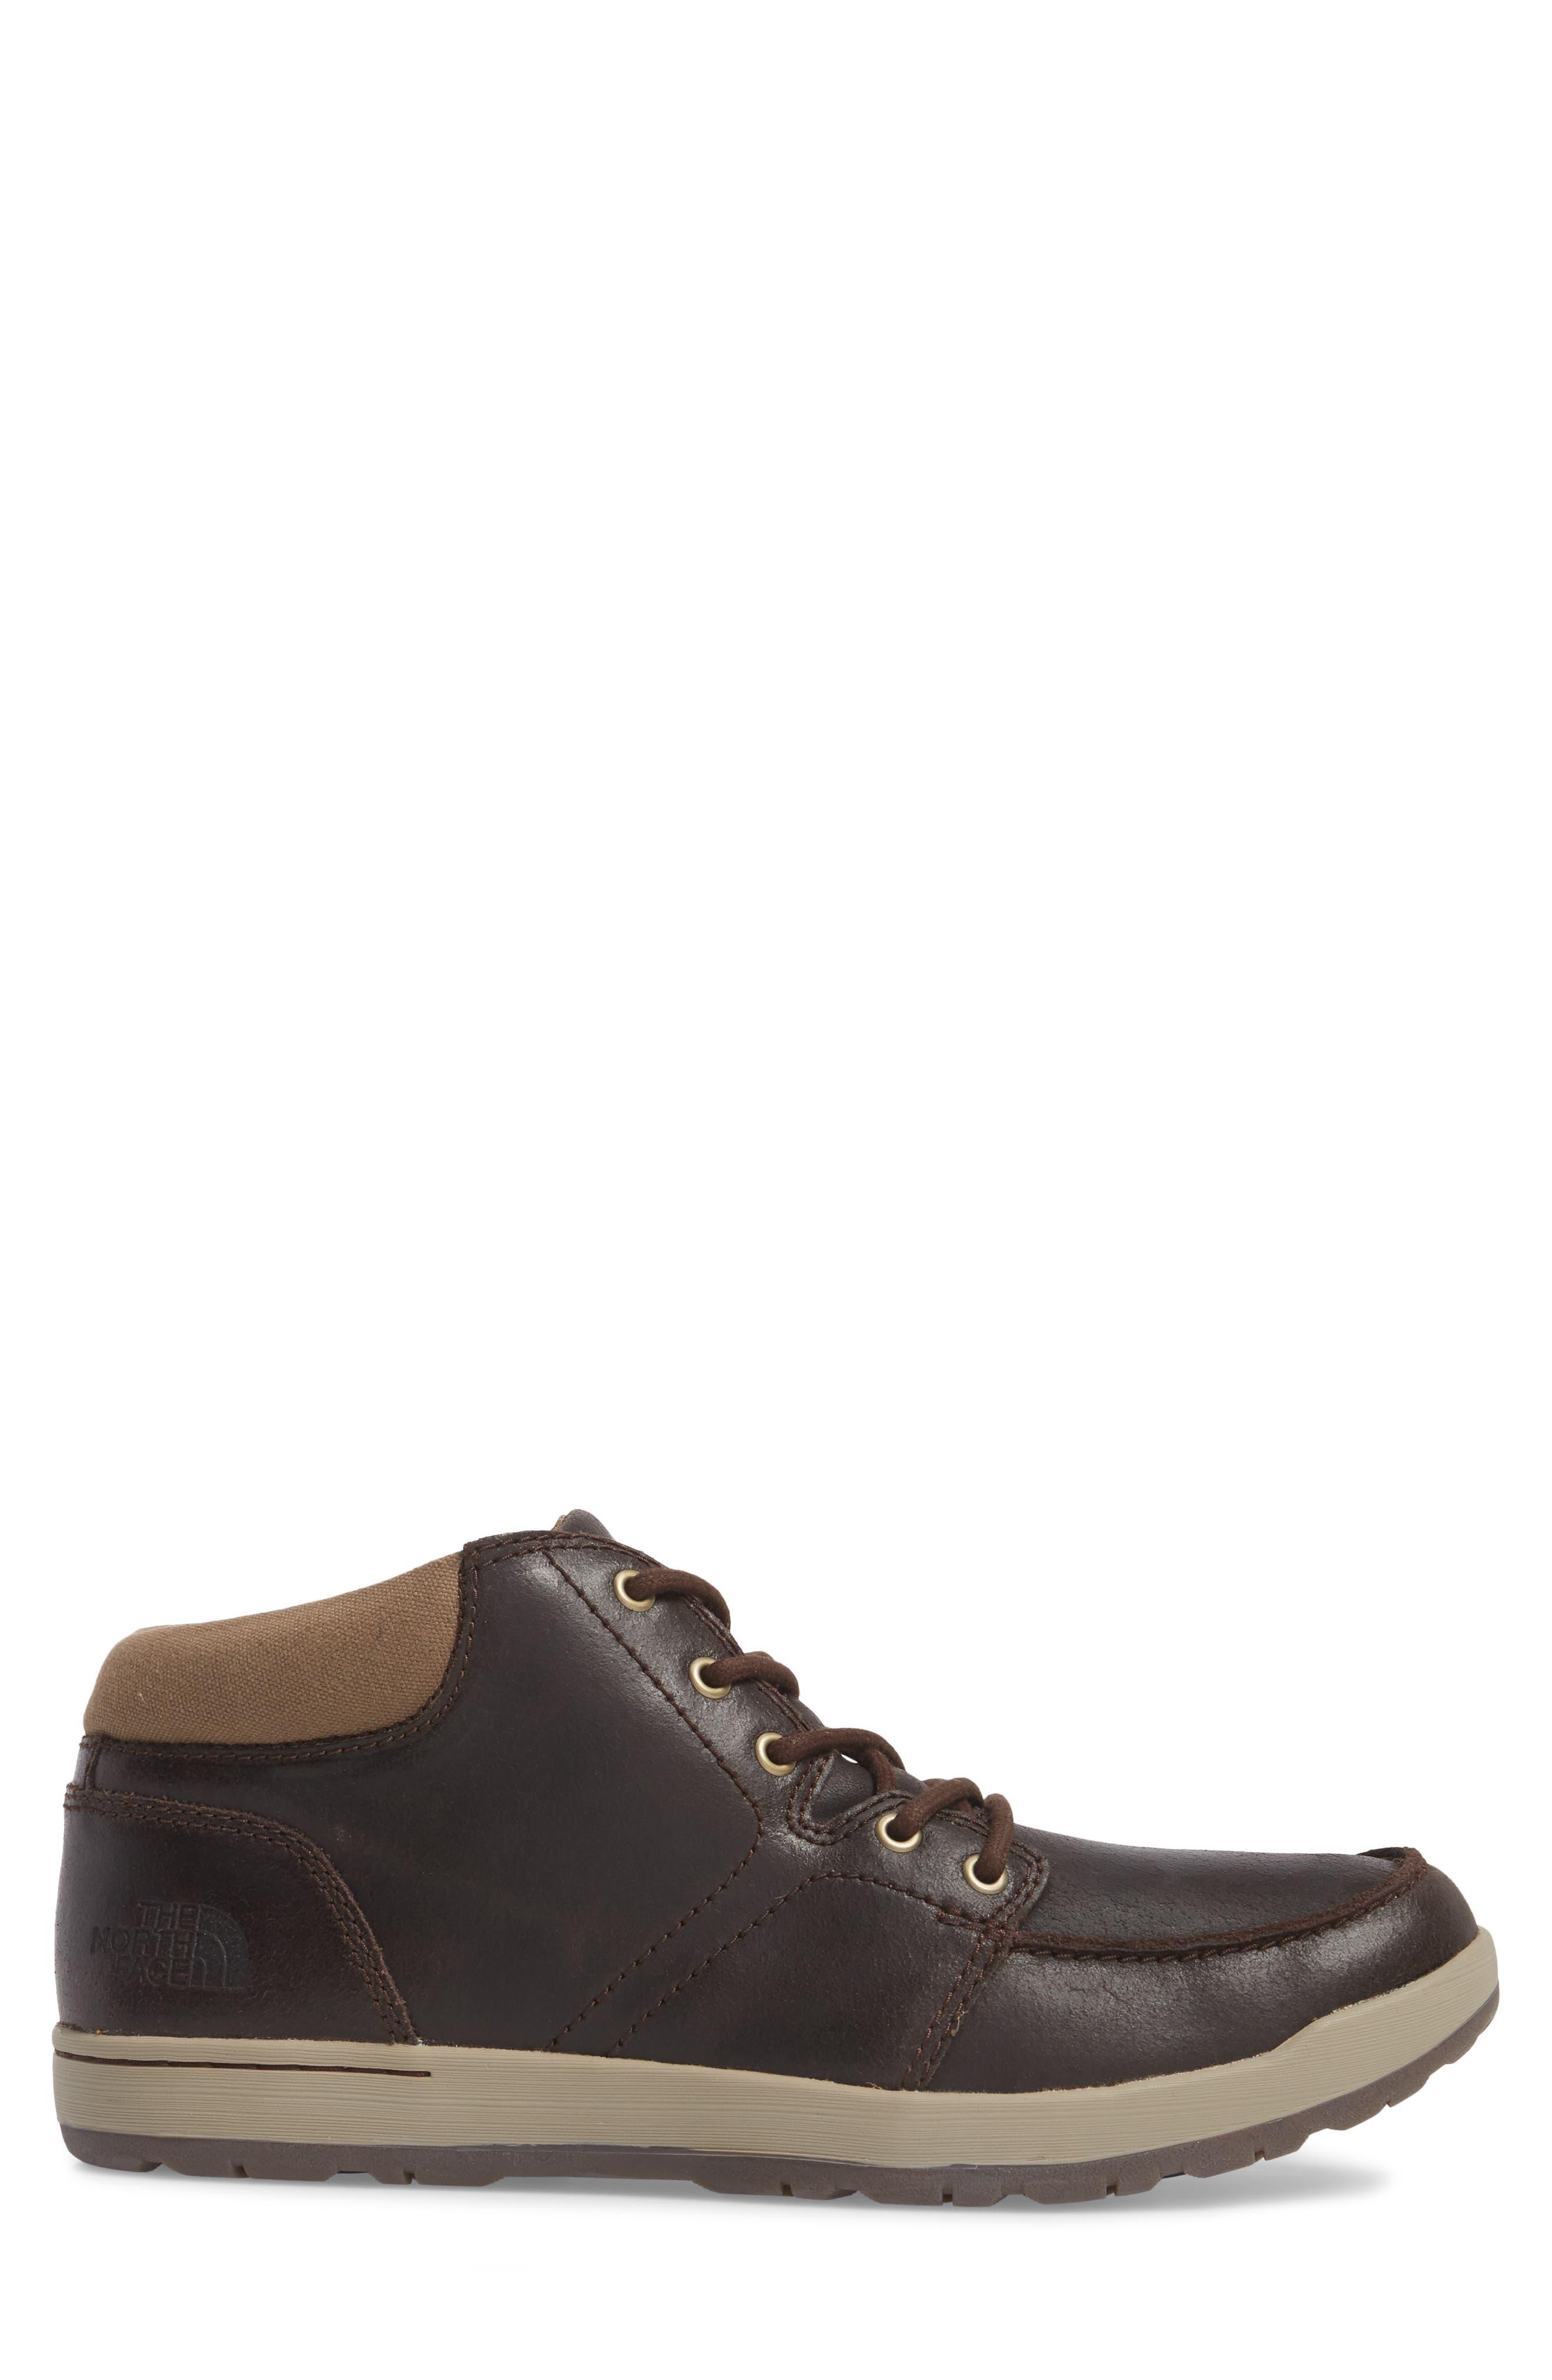 Ballard Evo Moc Toe Boot,                             Alternate thumbnail 3, color,                             210